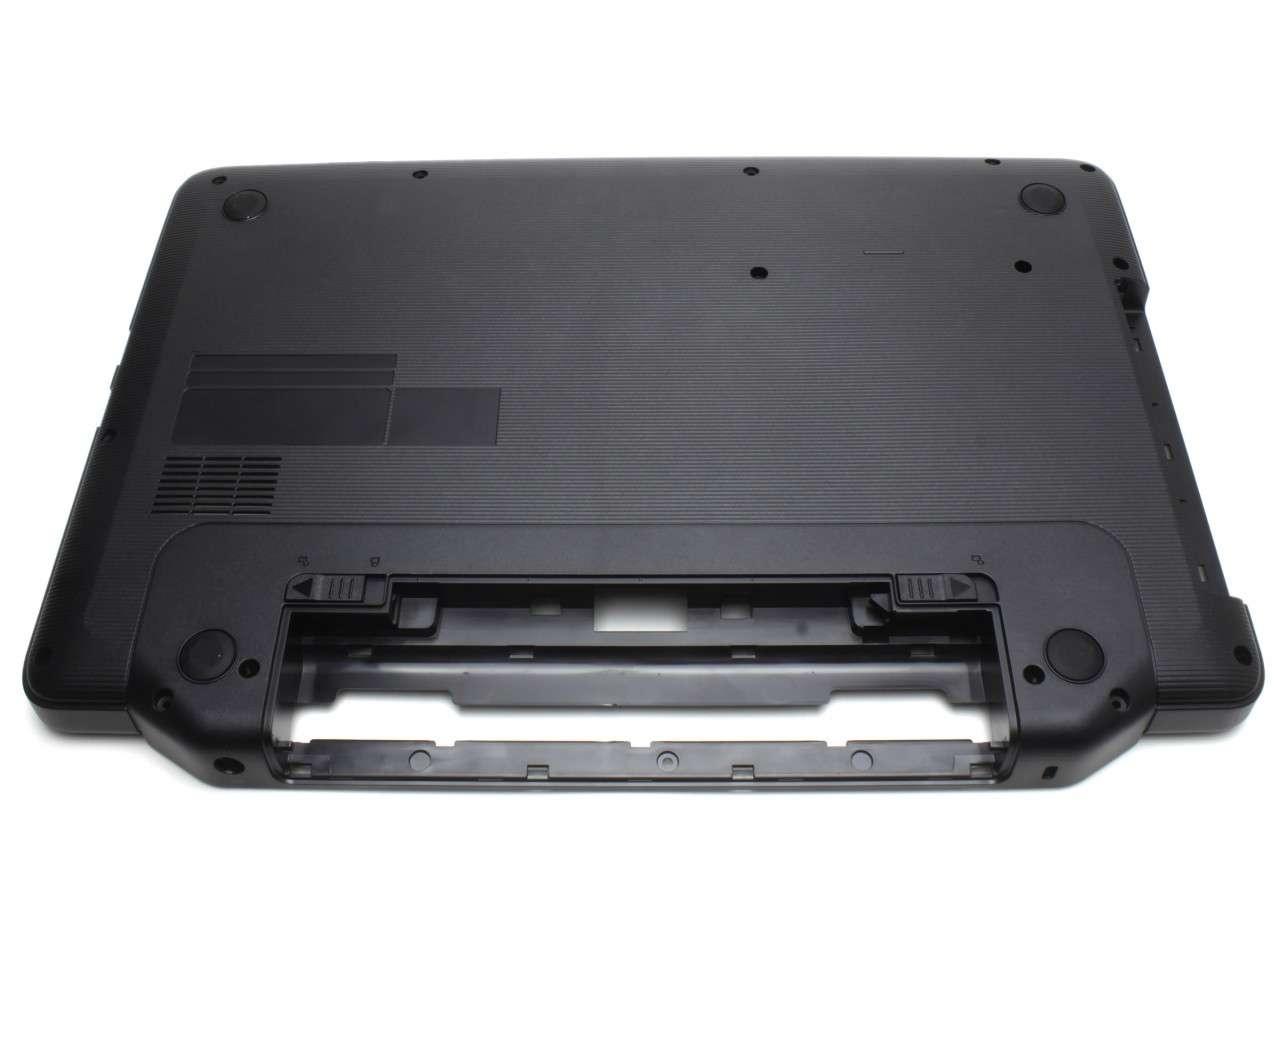 Bottom Case Dell CN 0Y J0RW 70166 2AT 1605 A03 Carcasa Inferioara Neagra imagine powerlaptop.ro 2021